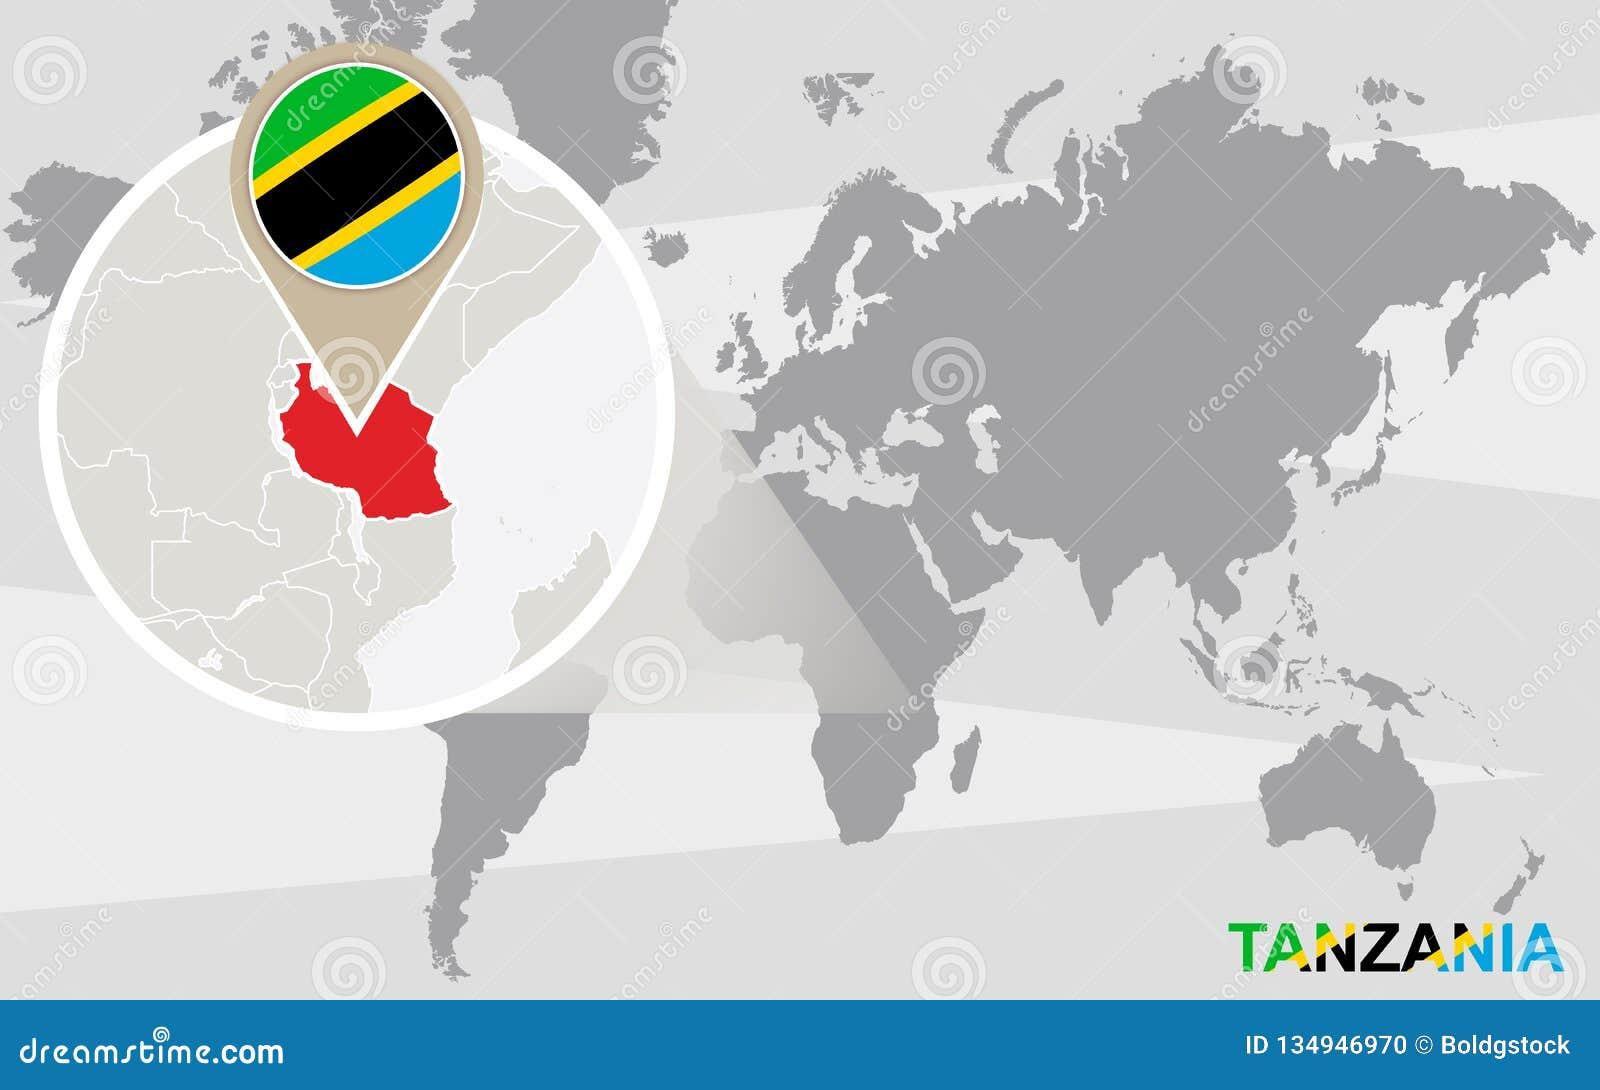 Tanzania Africa World Map.World Map With Magnified Tanzania Stock Vector